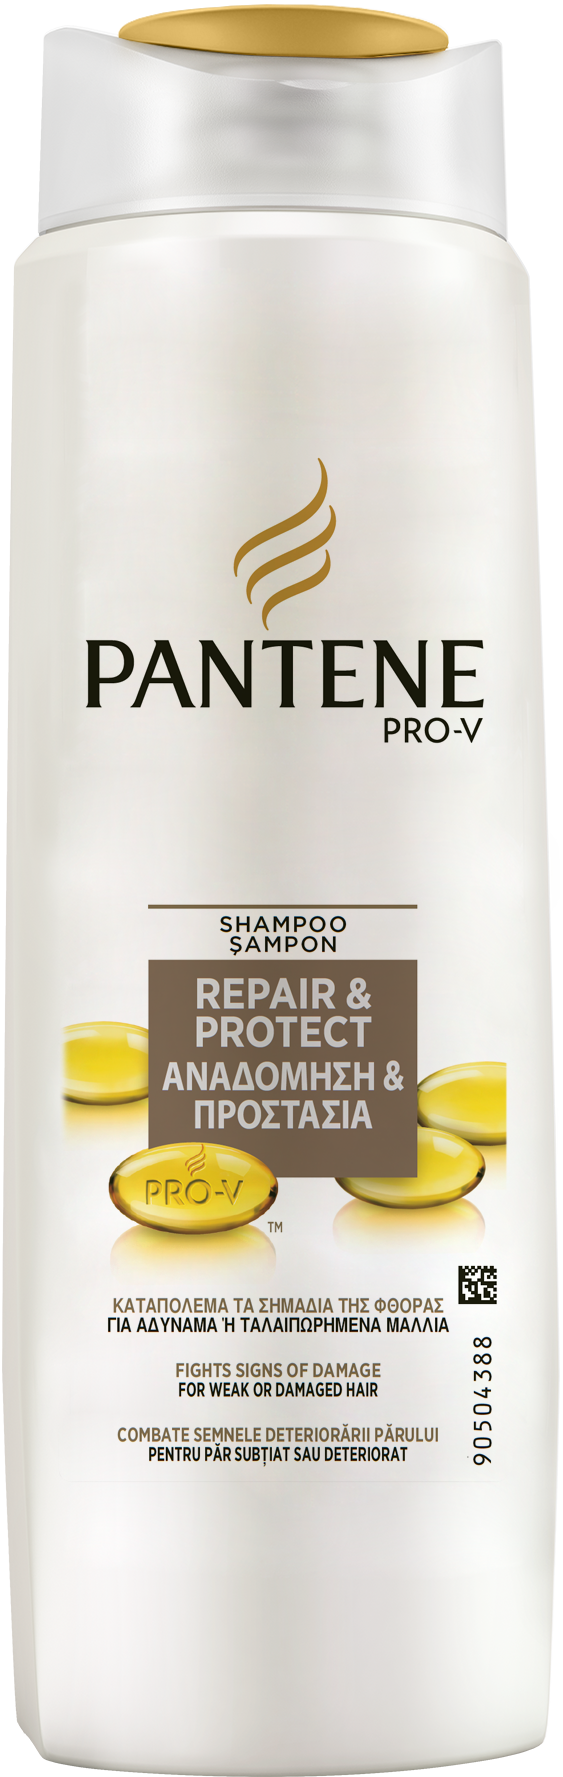 shamp-rapairprotect-250